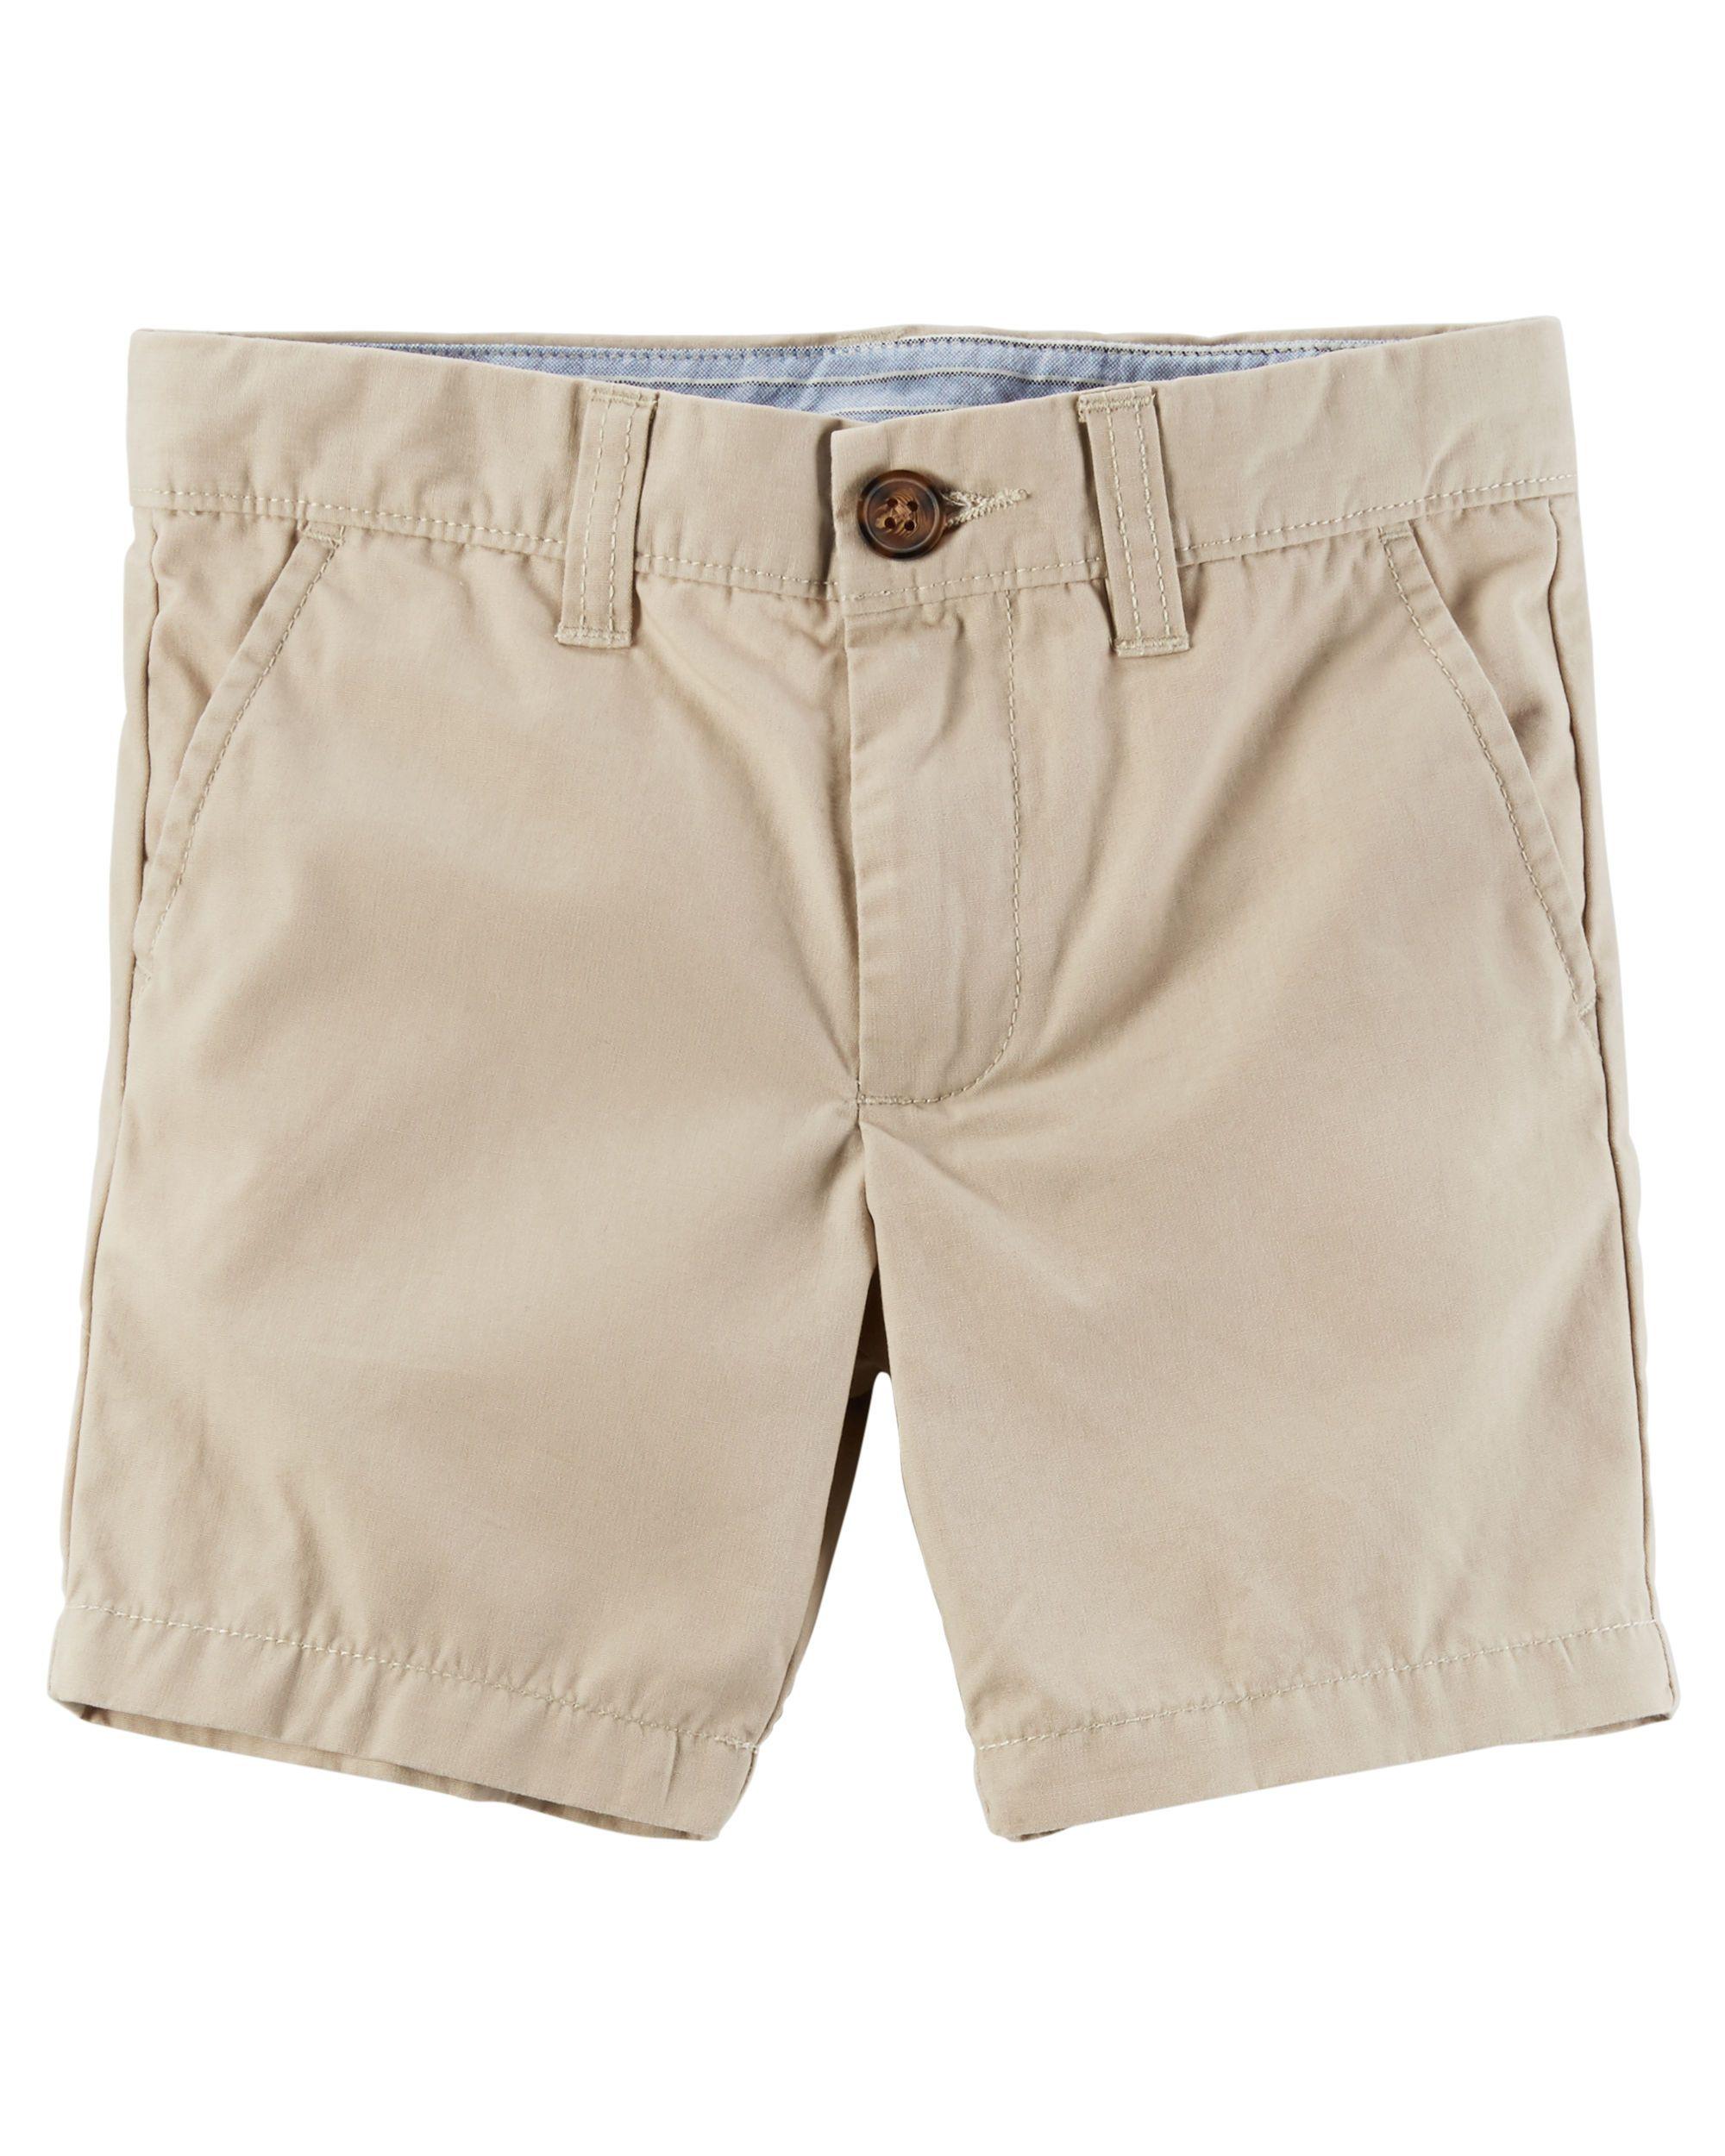 Flat Front Canvas Shorts Baby Boy Bottoms Toddler Boy